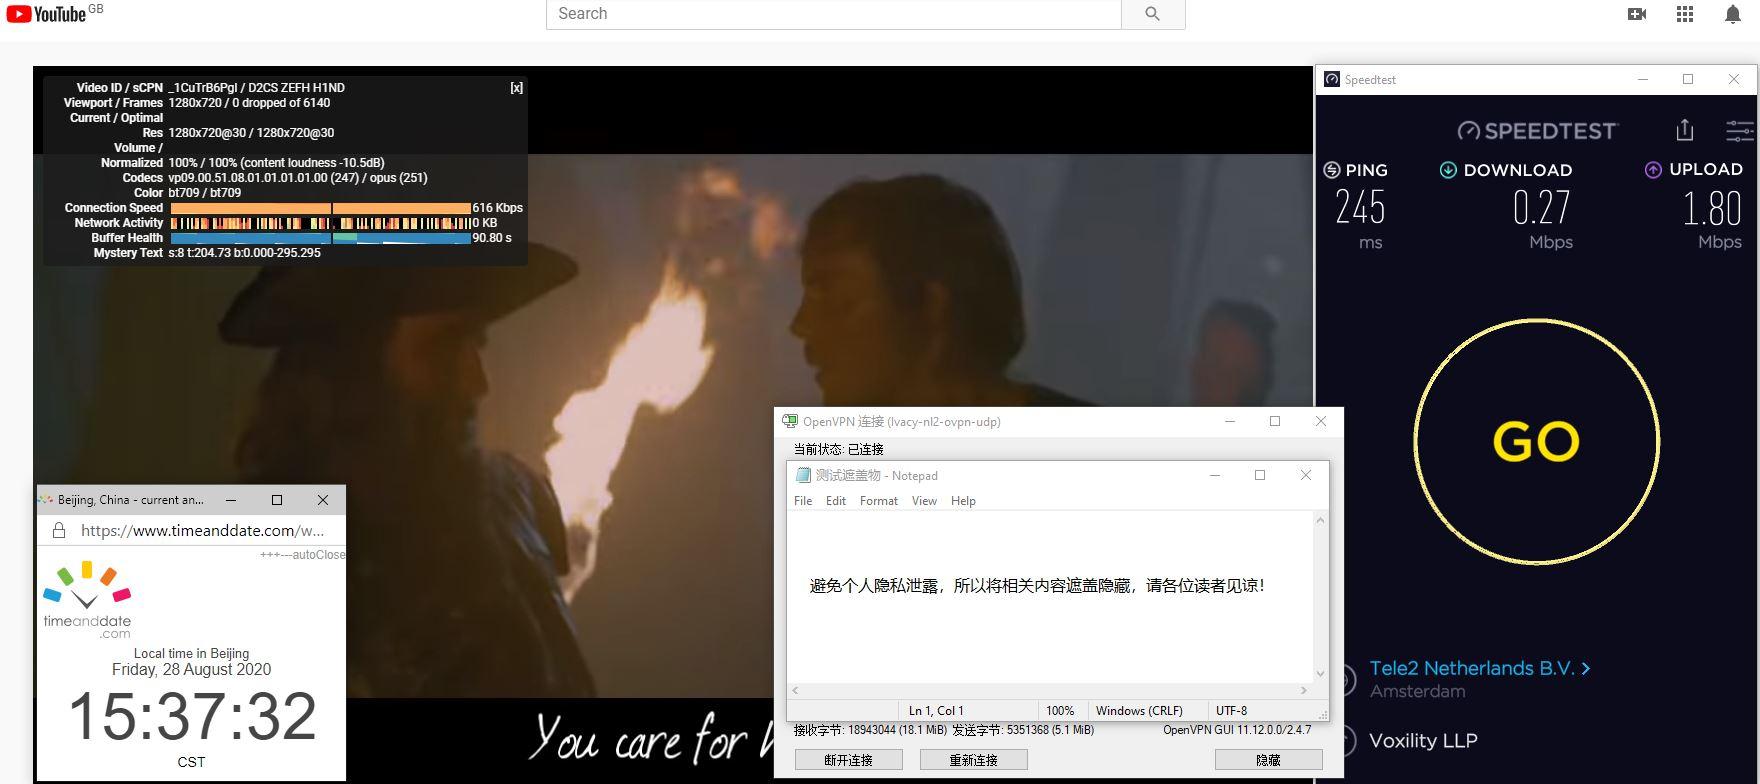 Windows10 IvacyVPN OpenVPN GUI nl2 中国VPN 翻墙 科学上网 翻墙速度测试 - 20200828